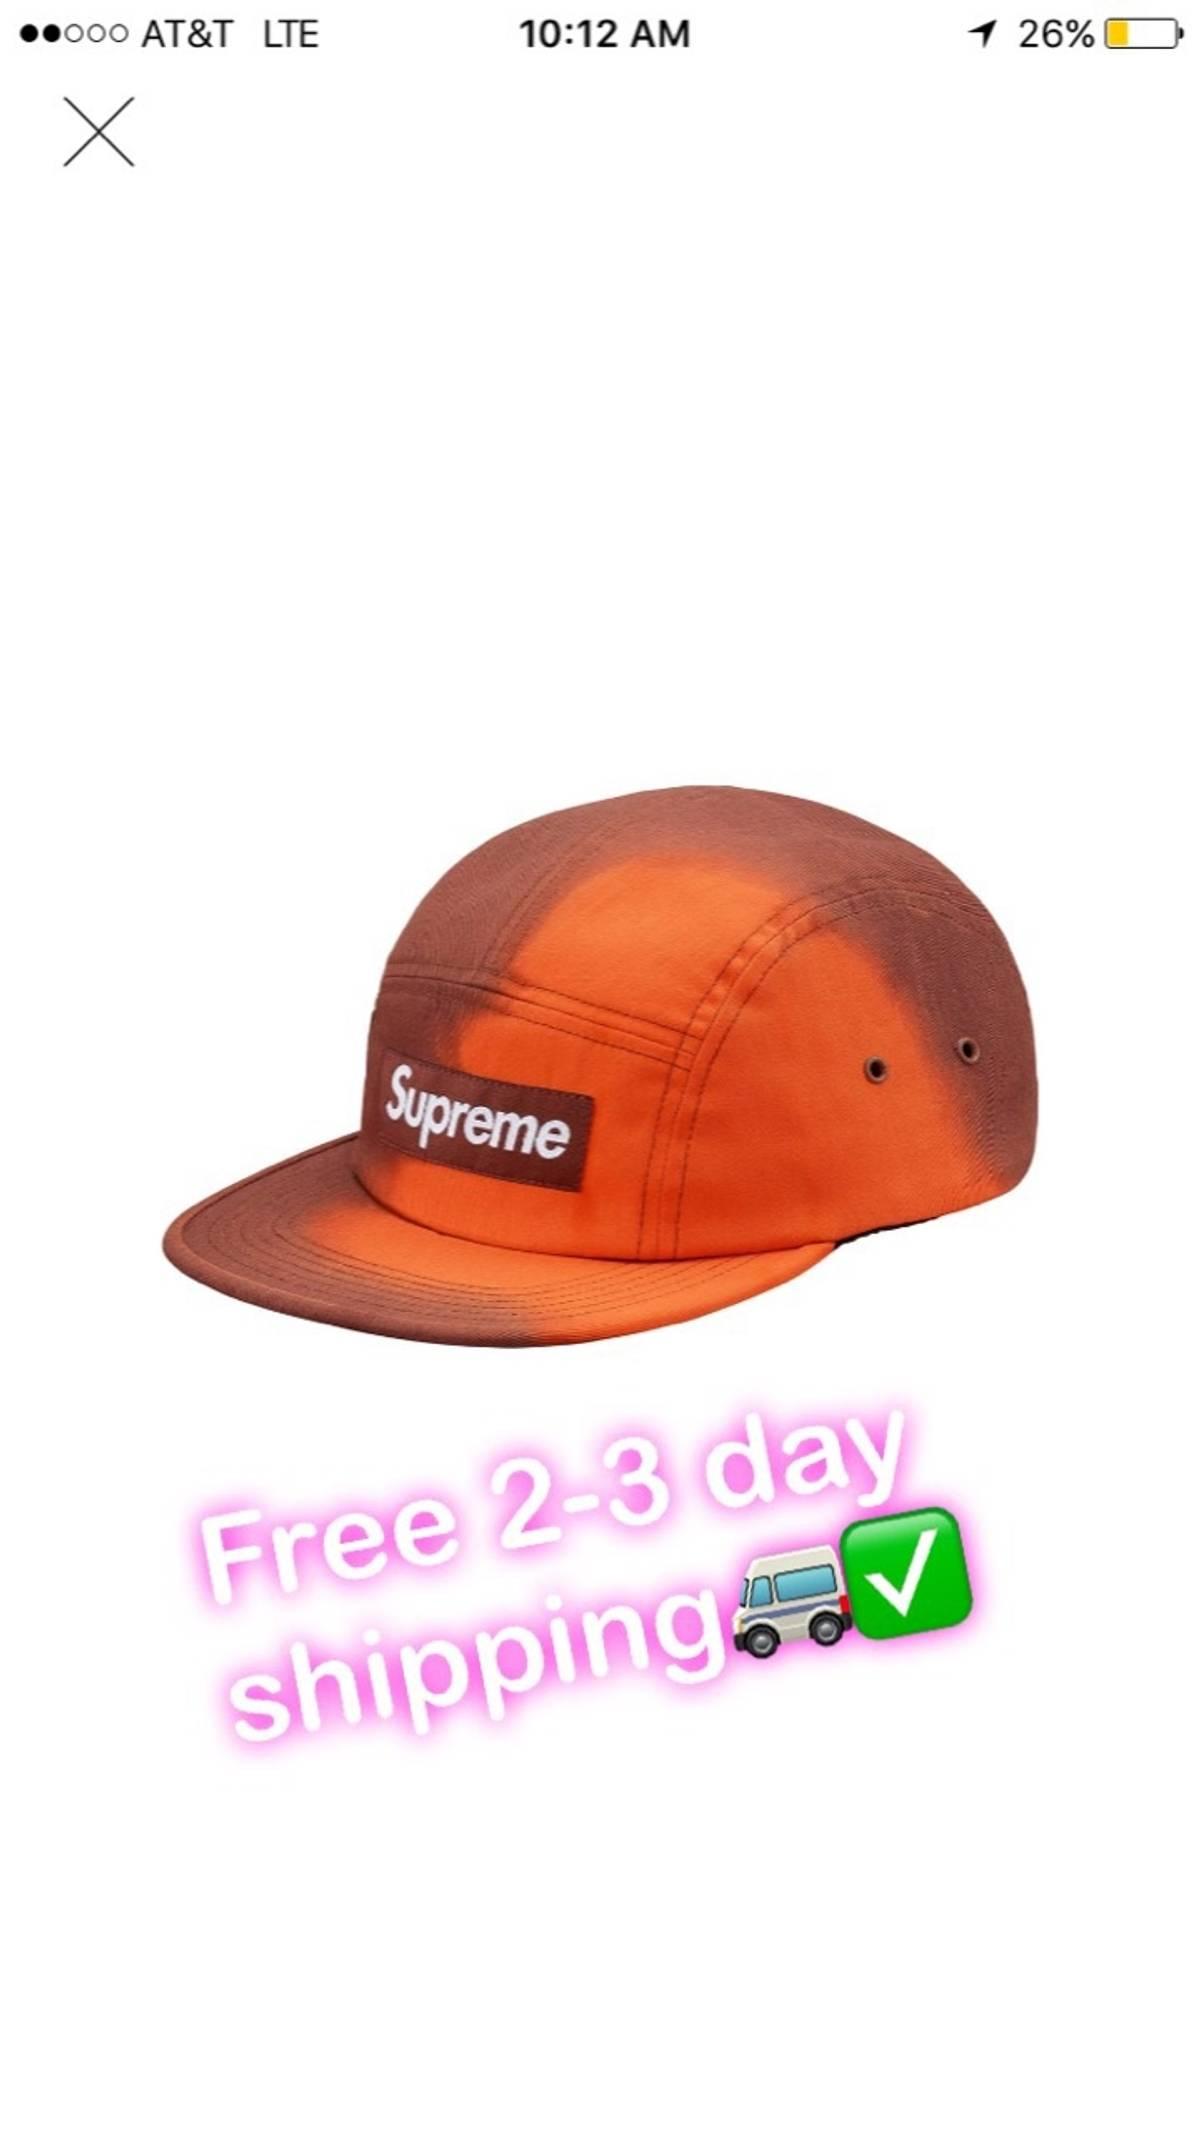 c9c4a1650c7 Supreme Supreme Heat Reactive Brown   Orange Camp Cap Size one size - Hats  for Sale - Grailed